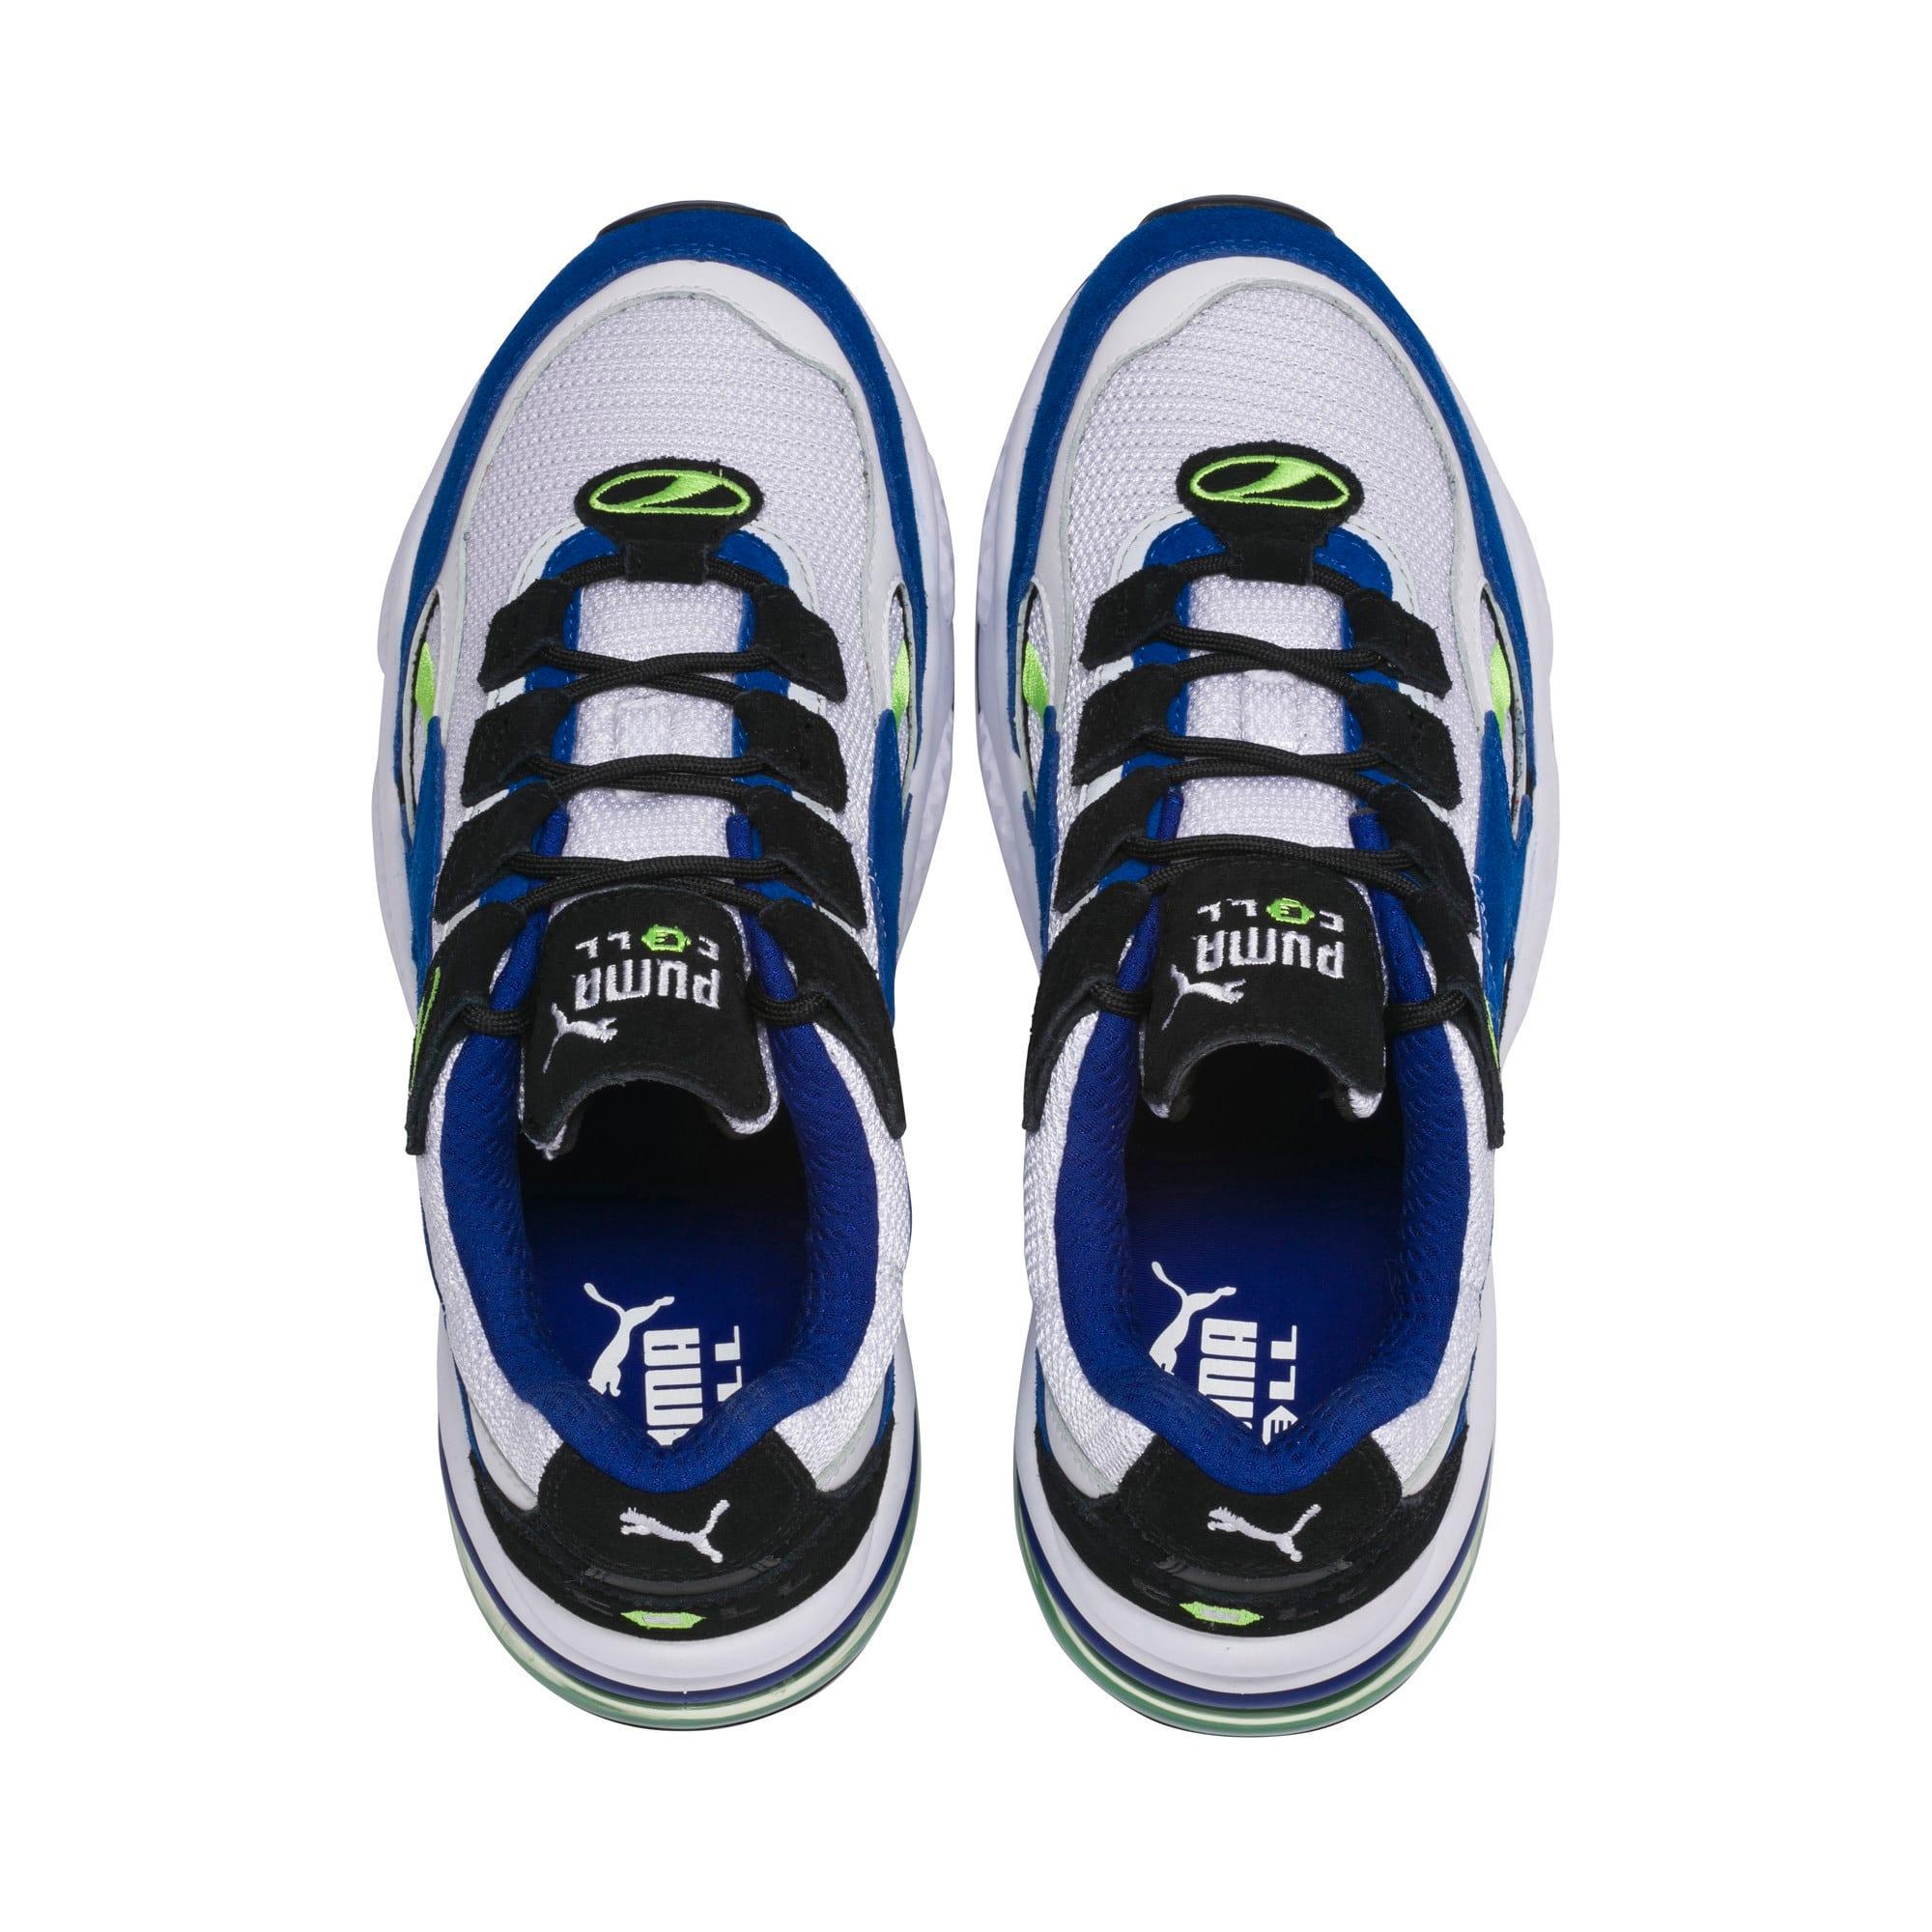 Thumbnail 8 of CELL Venom Men's Sneakers, Puma White-Surf The Web, medium